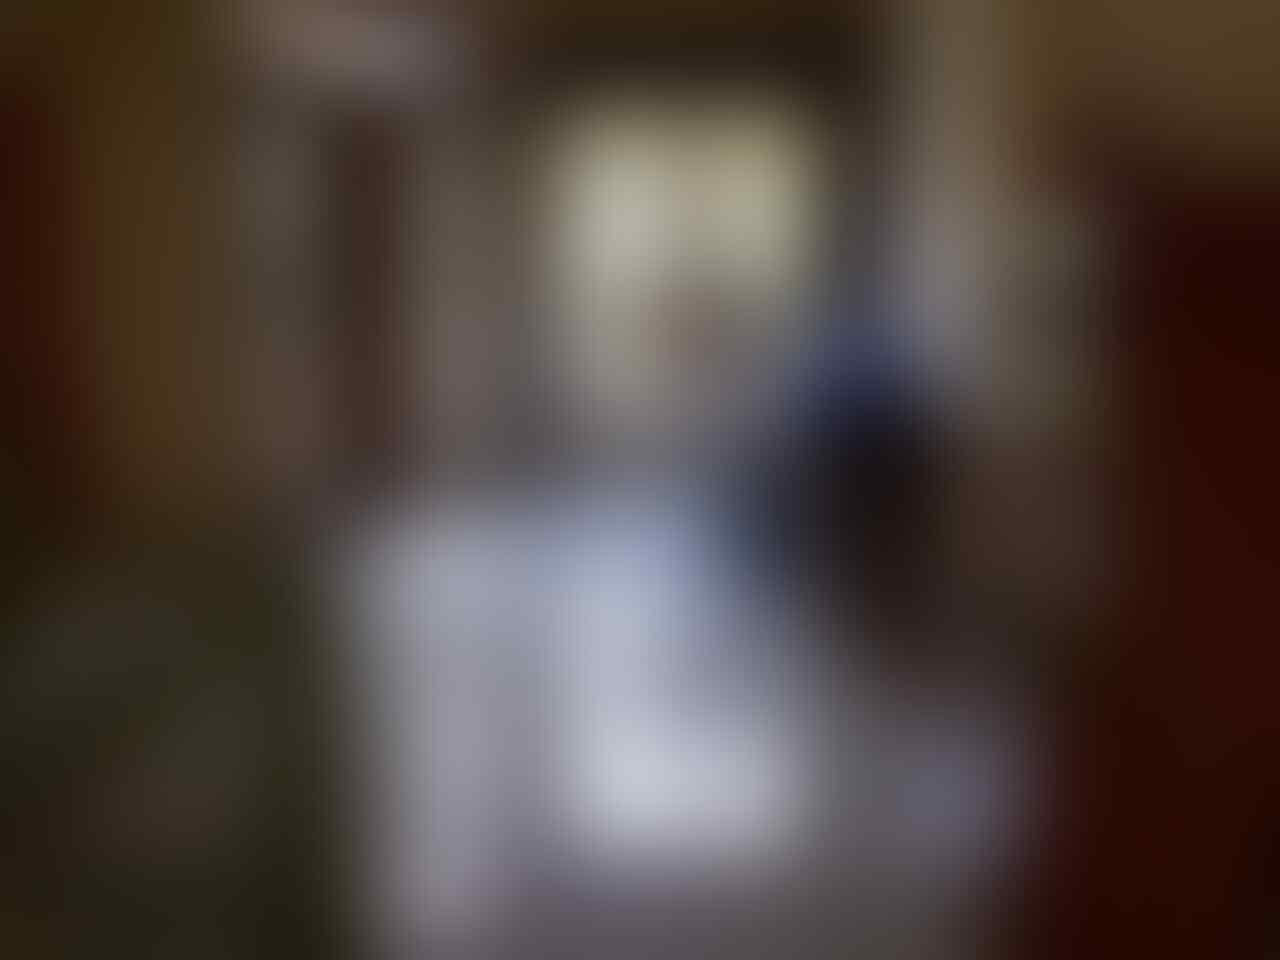 Rumah 2 Lantai Luas Kokoh Bagus Di Gisikdrono Smg Barat